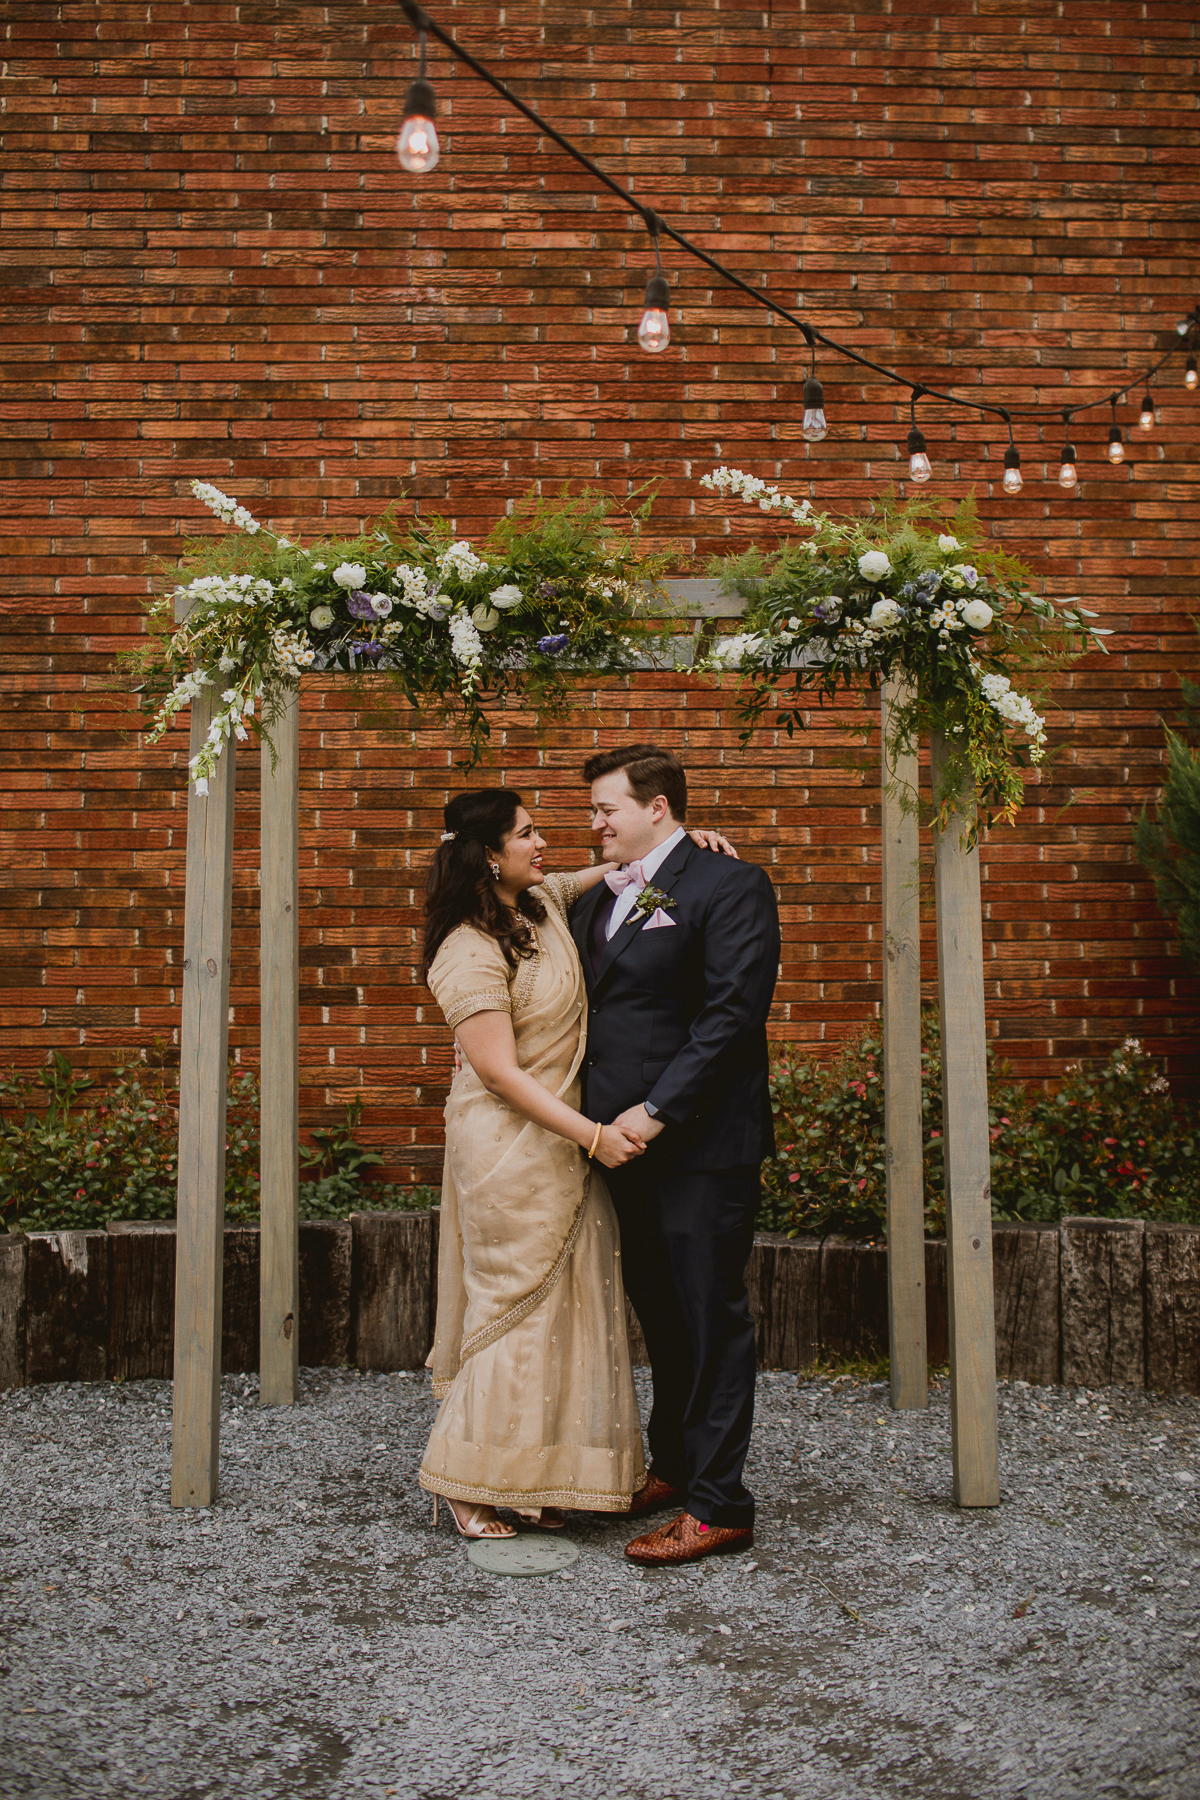 eventide-brewery-indian-american-fusion-kelley-raye-atlanta-los-angeles-wedding-photographer-96.jpg